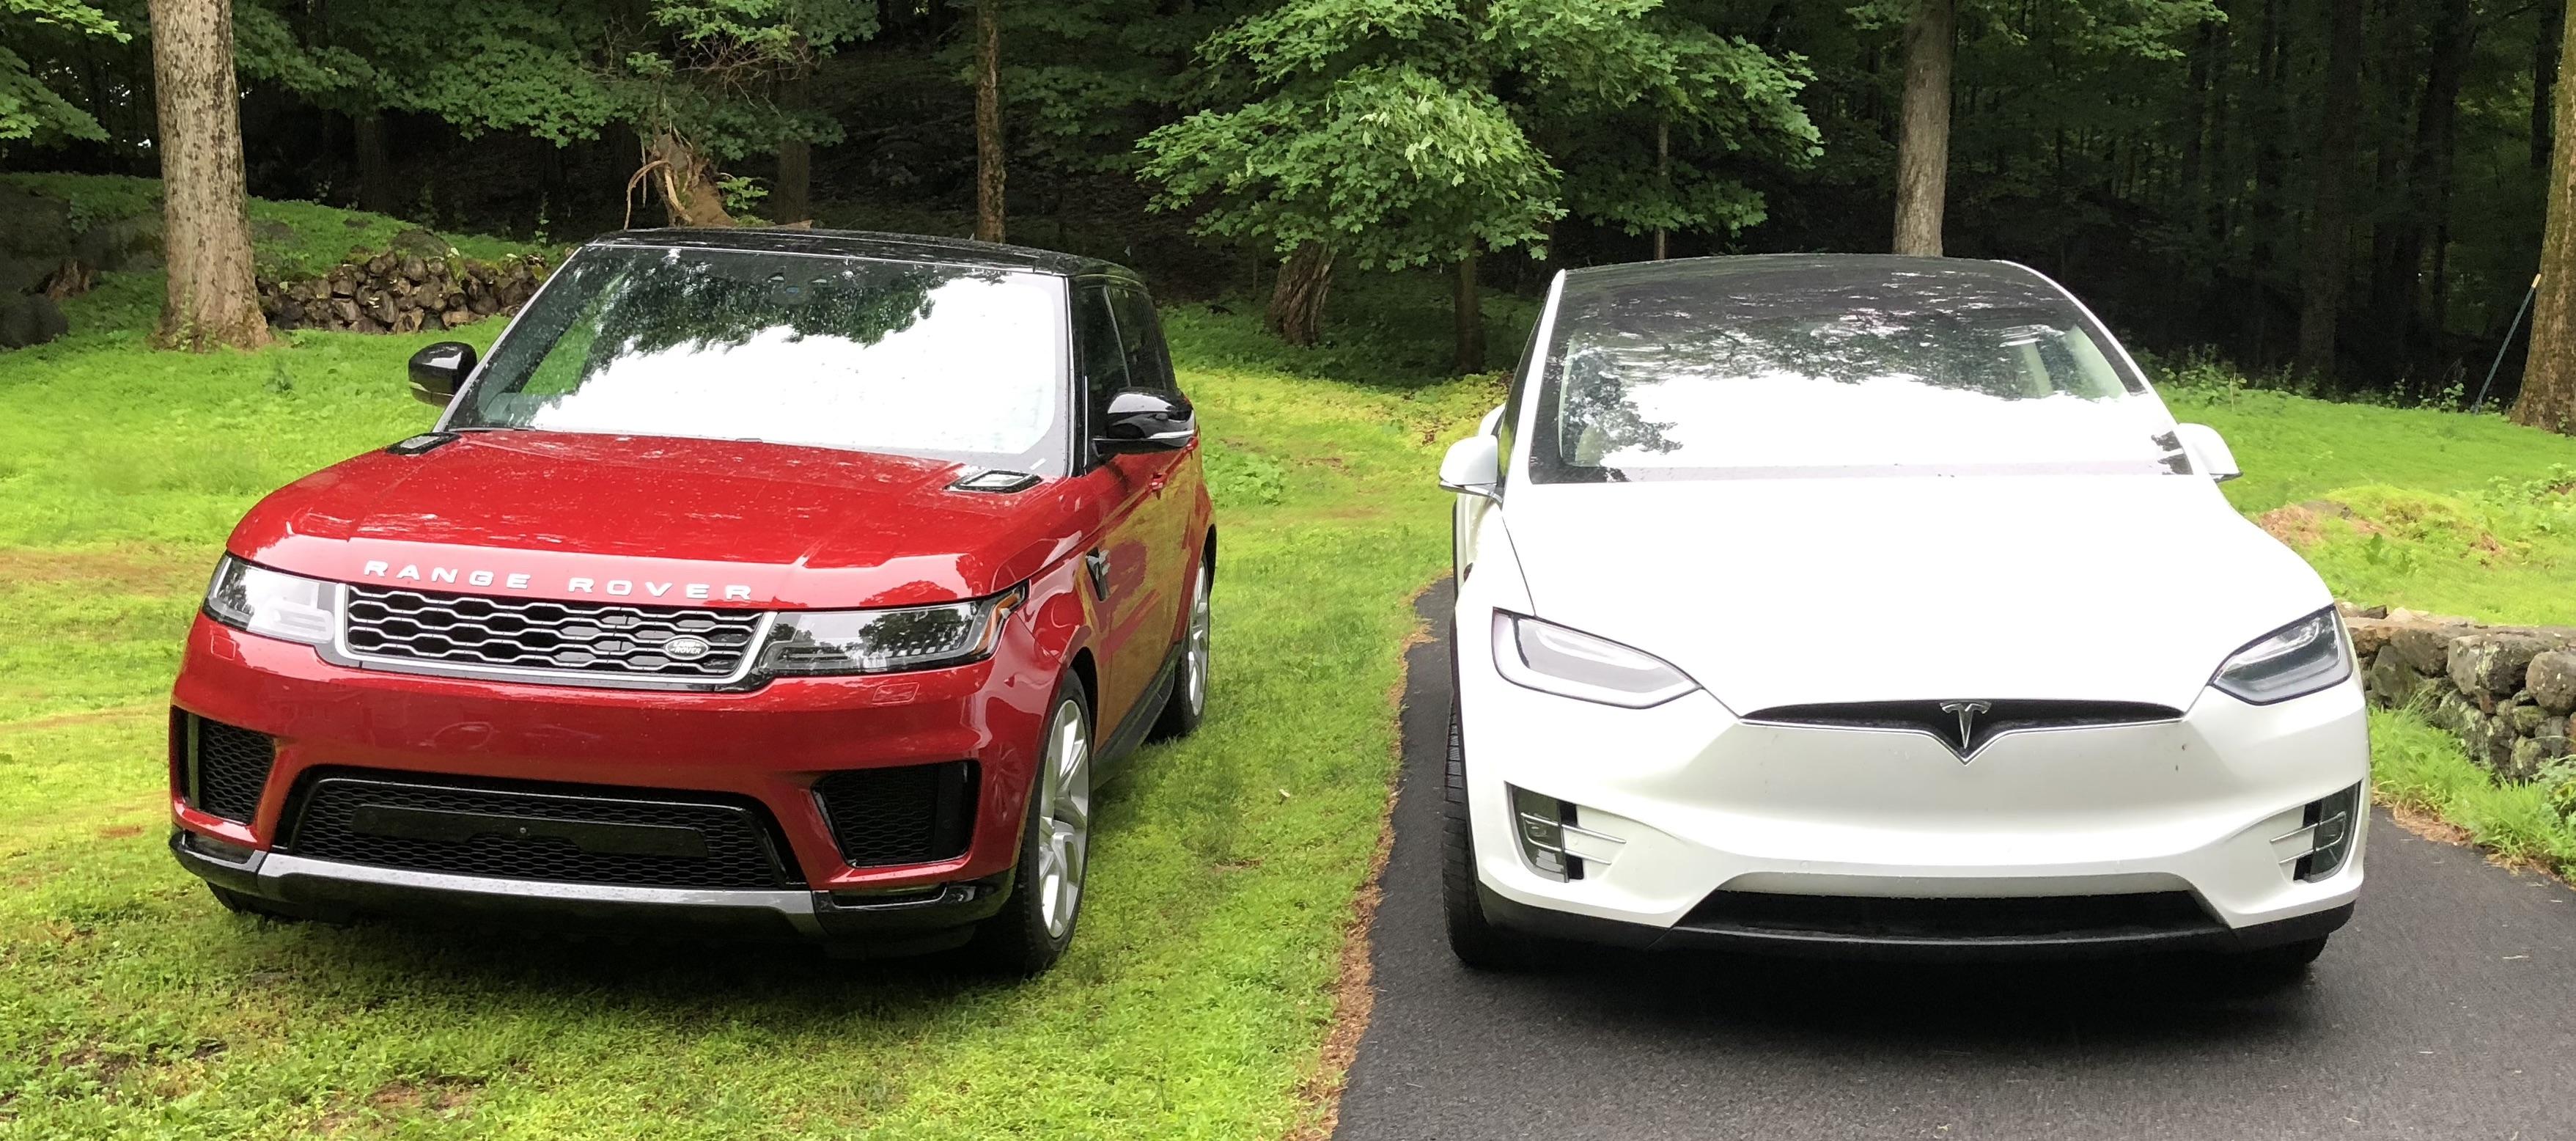 Range Rover Sport PHEV next to Tesla Model X